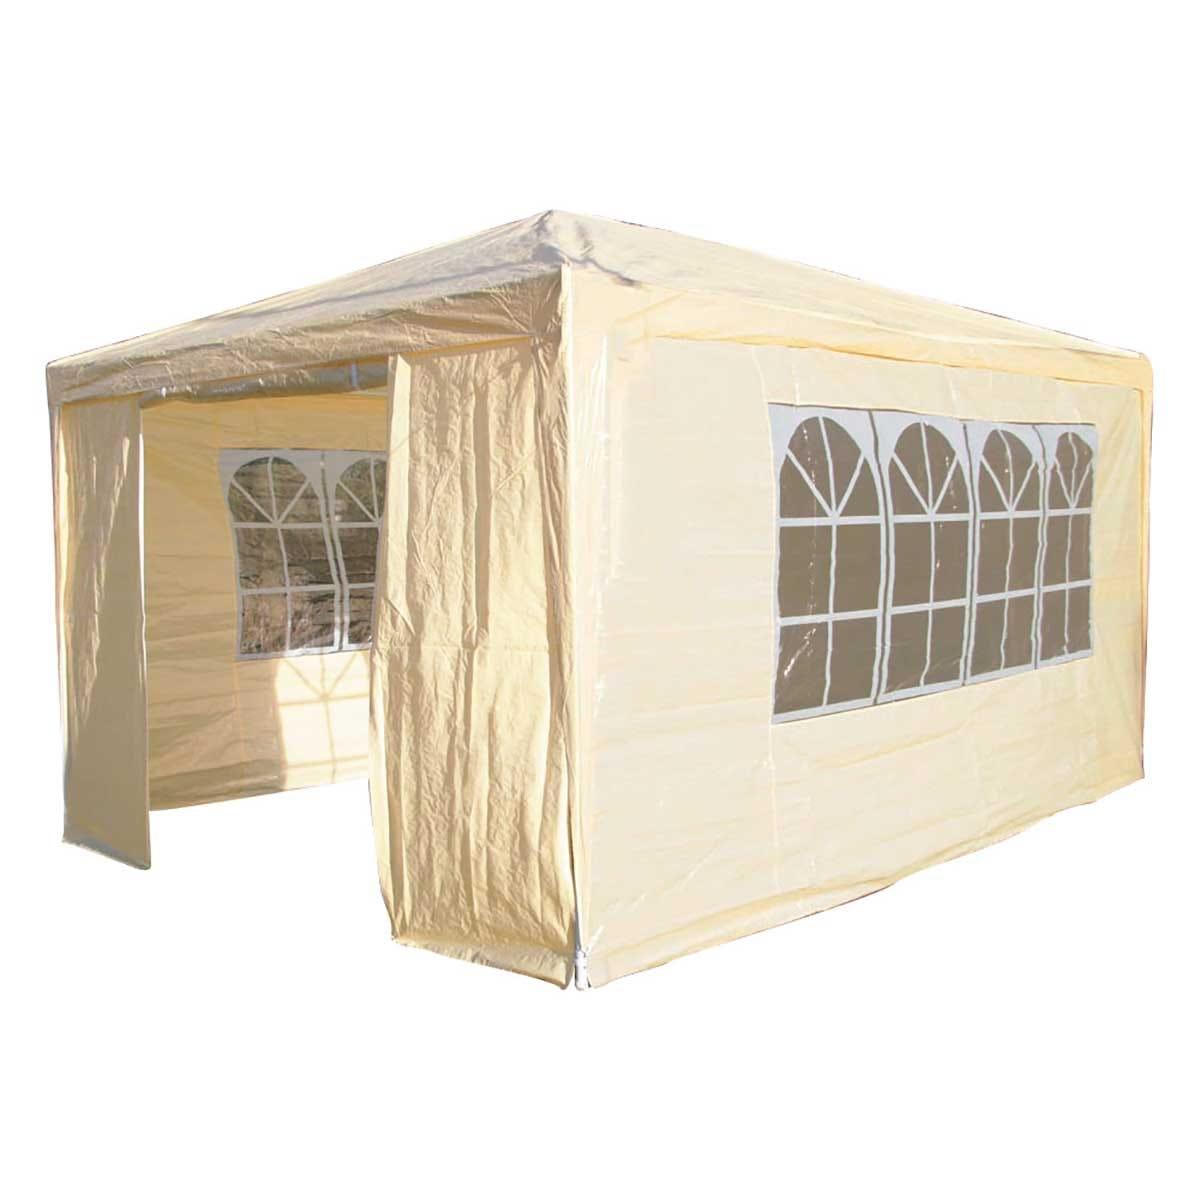 Airwave 4m x 3m Value Party Tent Gazebo - Beige